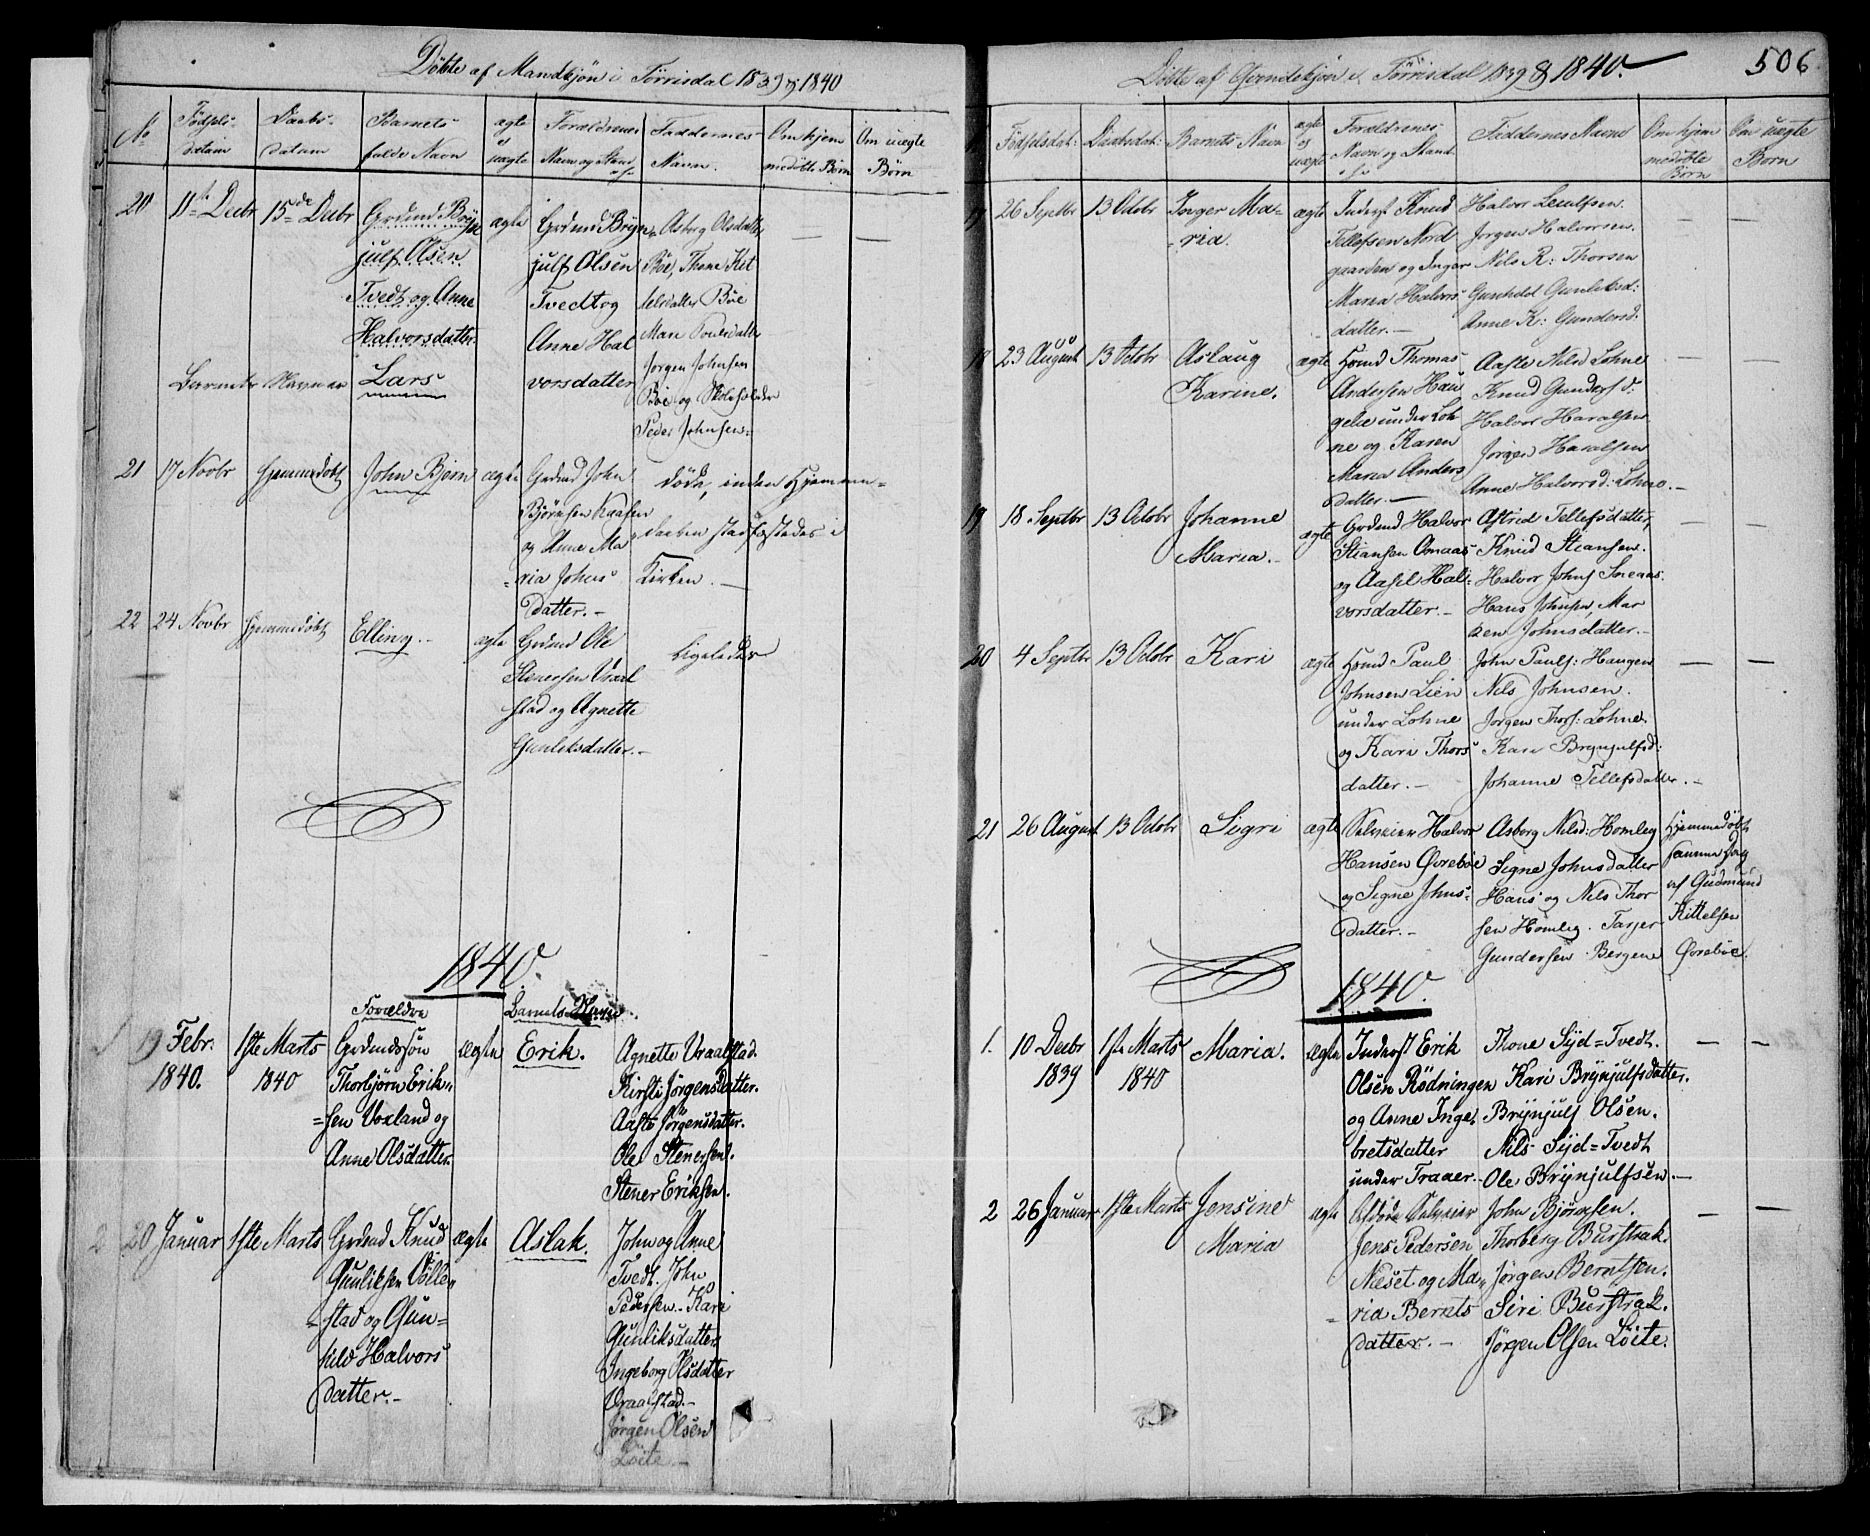 SAKO, Drangedal kirkebøker, F/Fa/L0007b: Ministerialbok nr. 7b, 1837-1856, s. 506